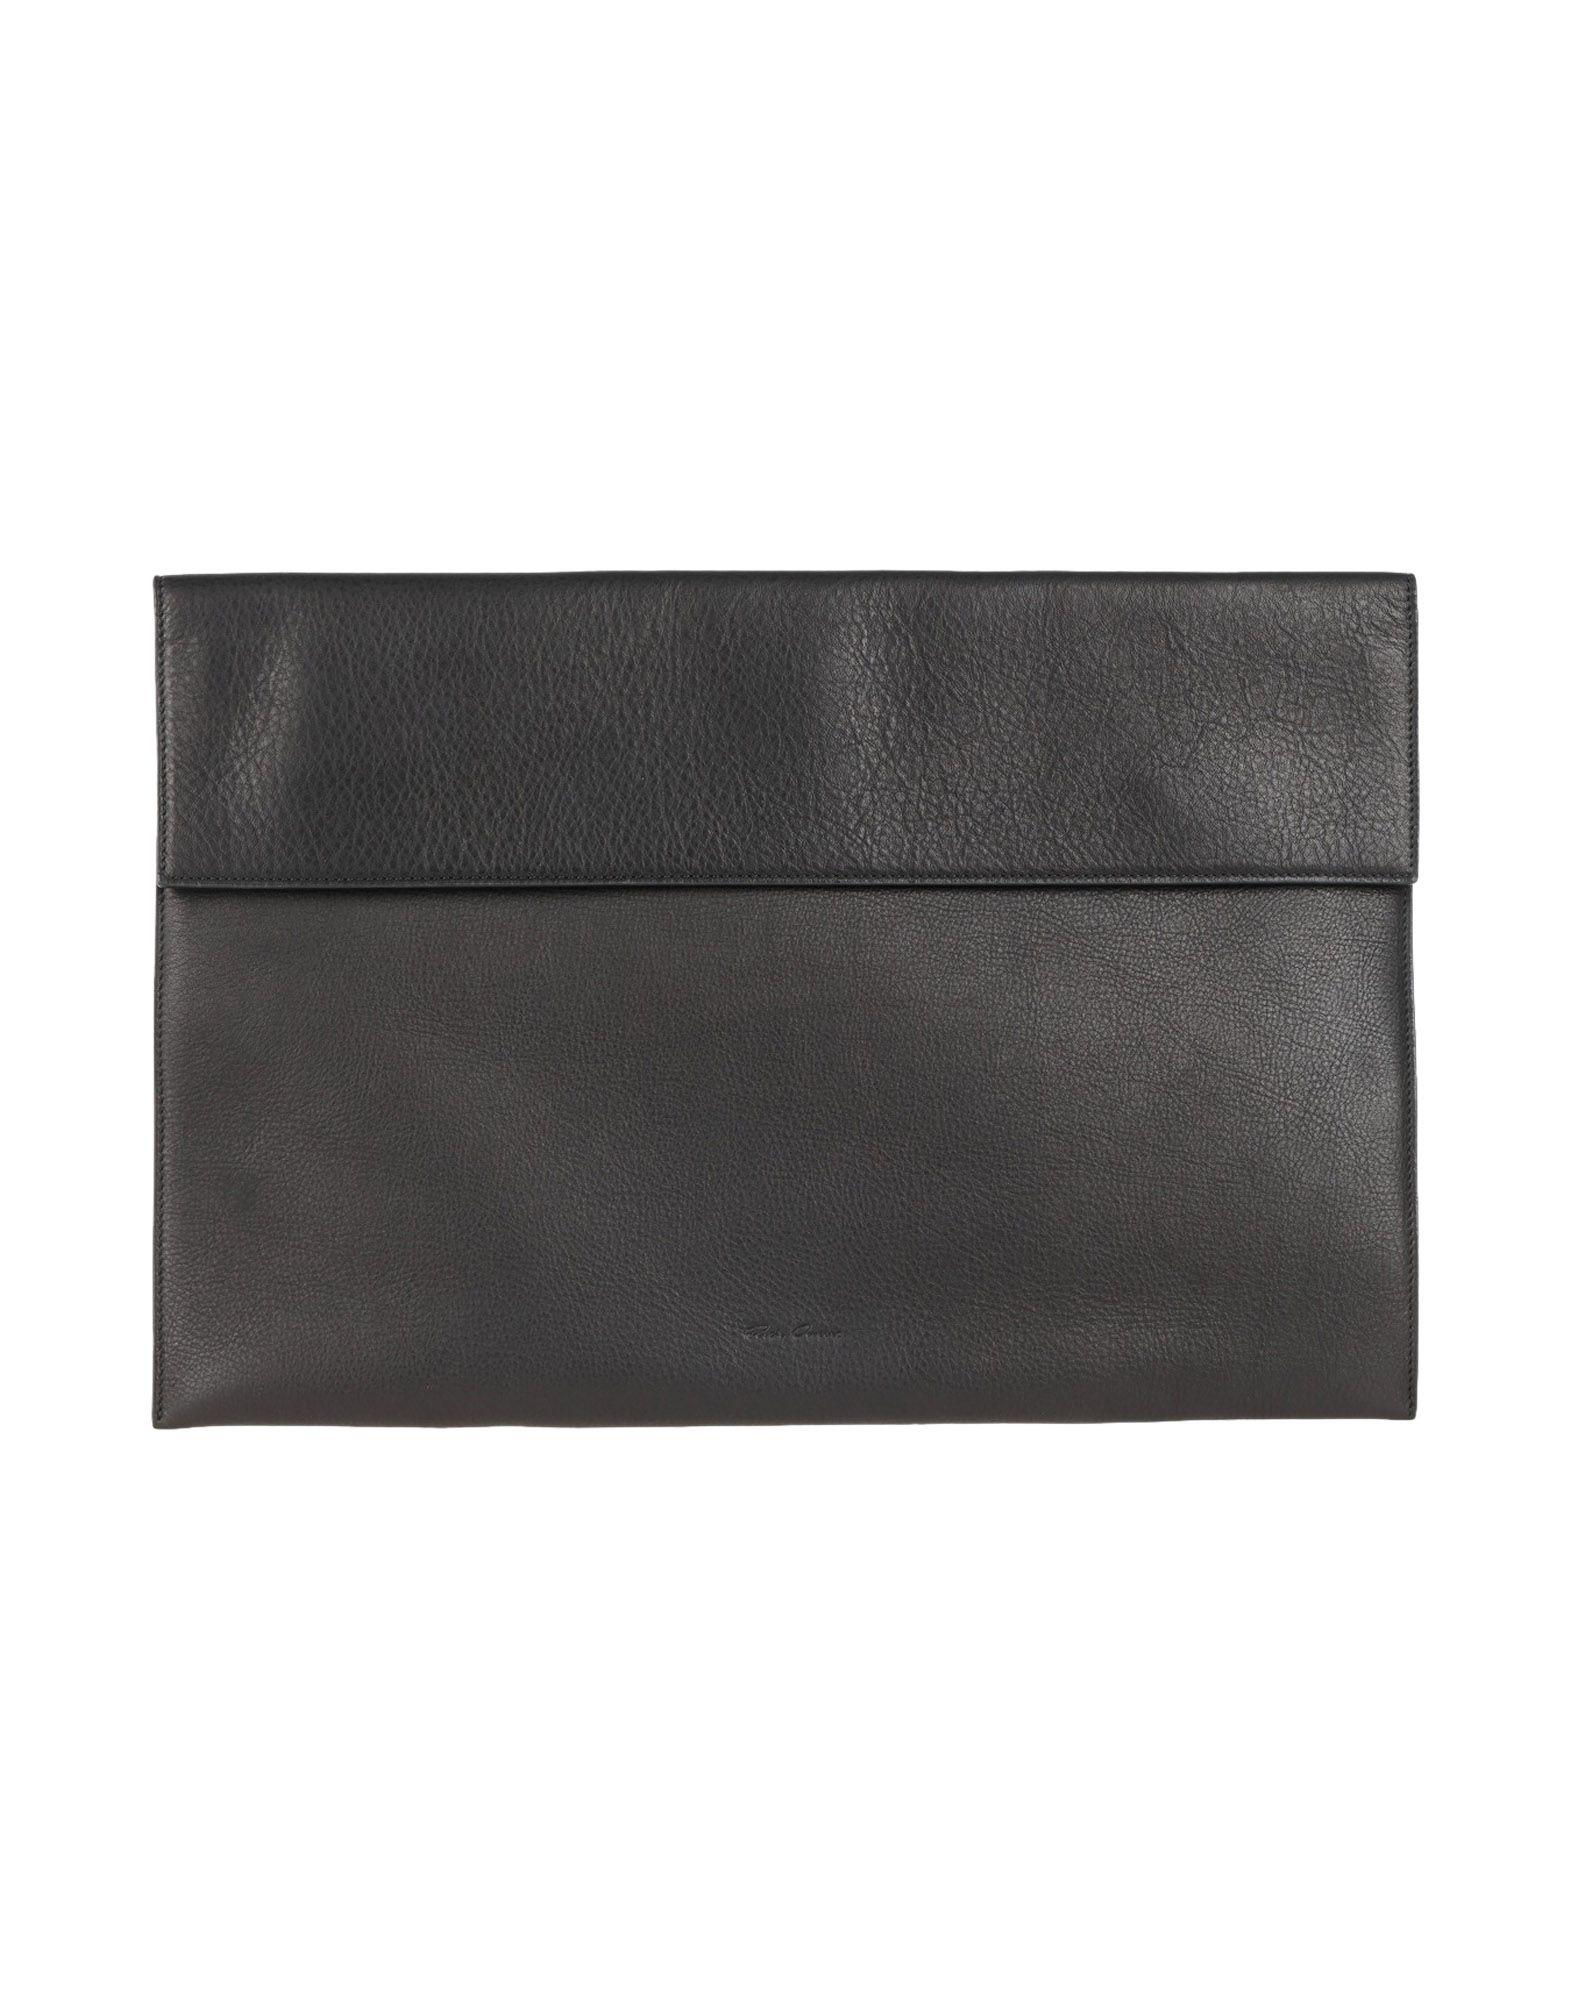 RICK OWENS Деловые сумки сумки